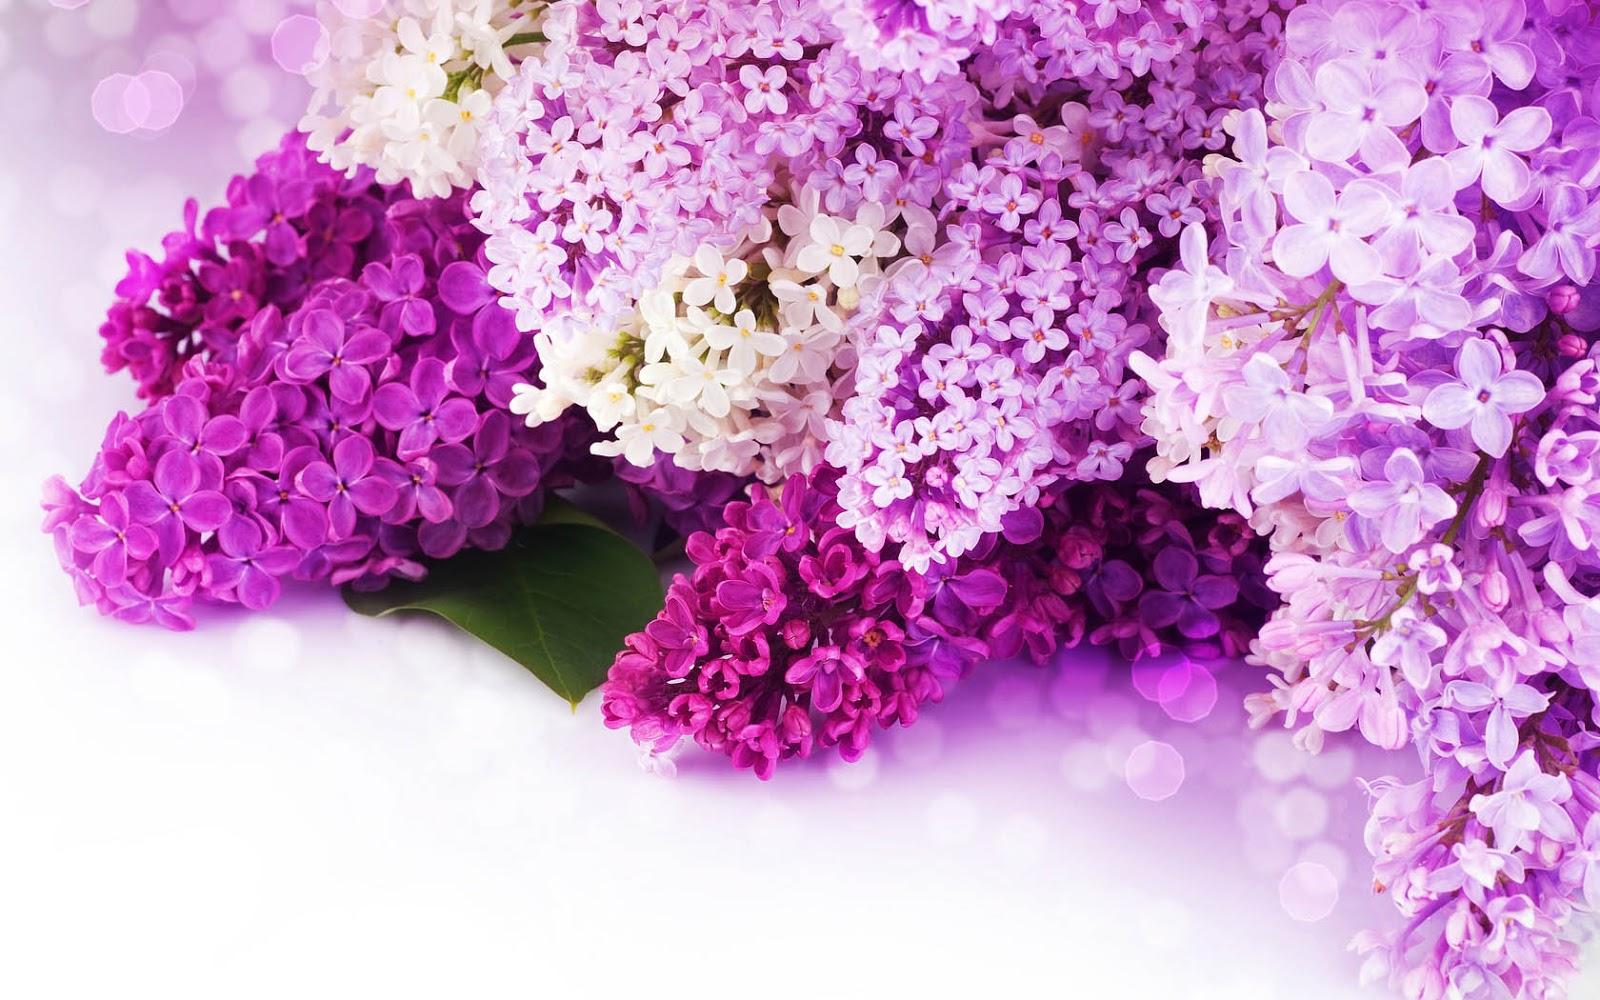 download wallpaper 1024x600 lilac - photo #30